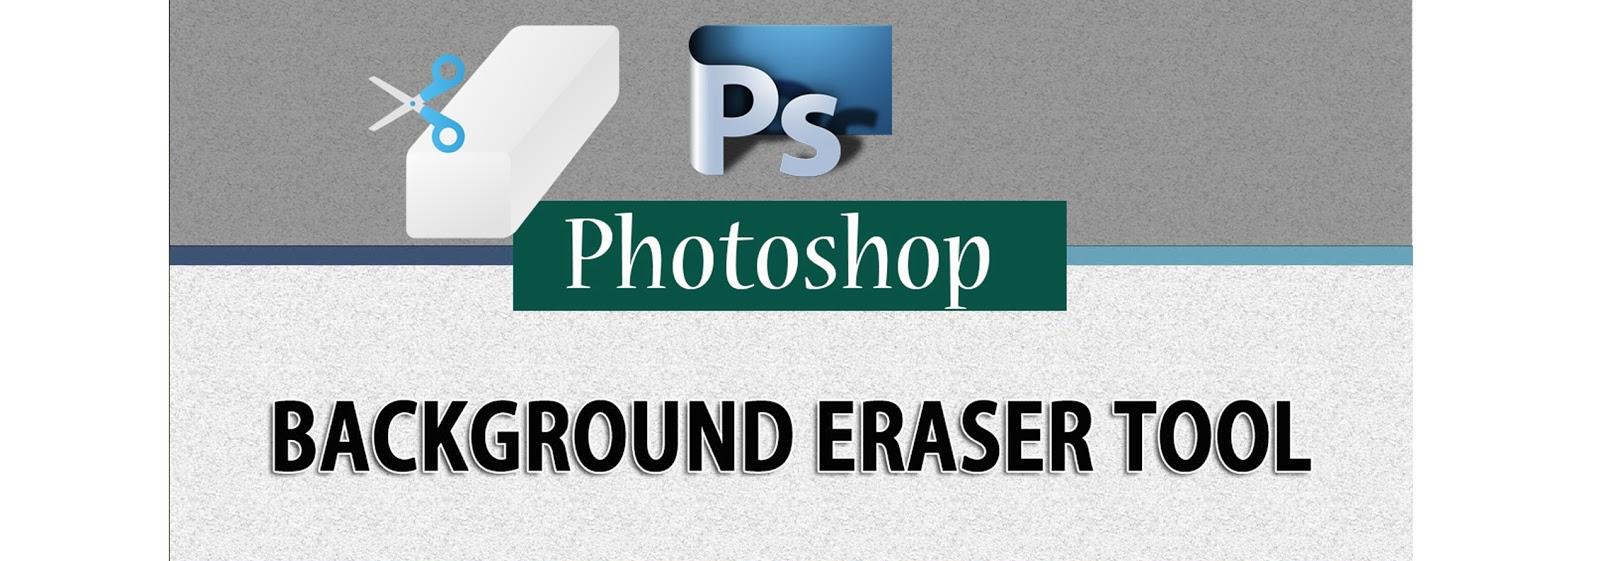 the background eraser tool in photoshop to erase background